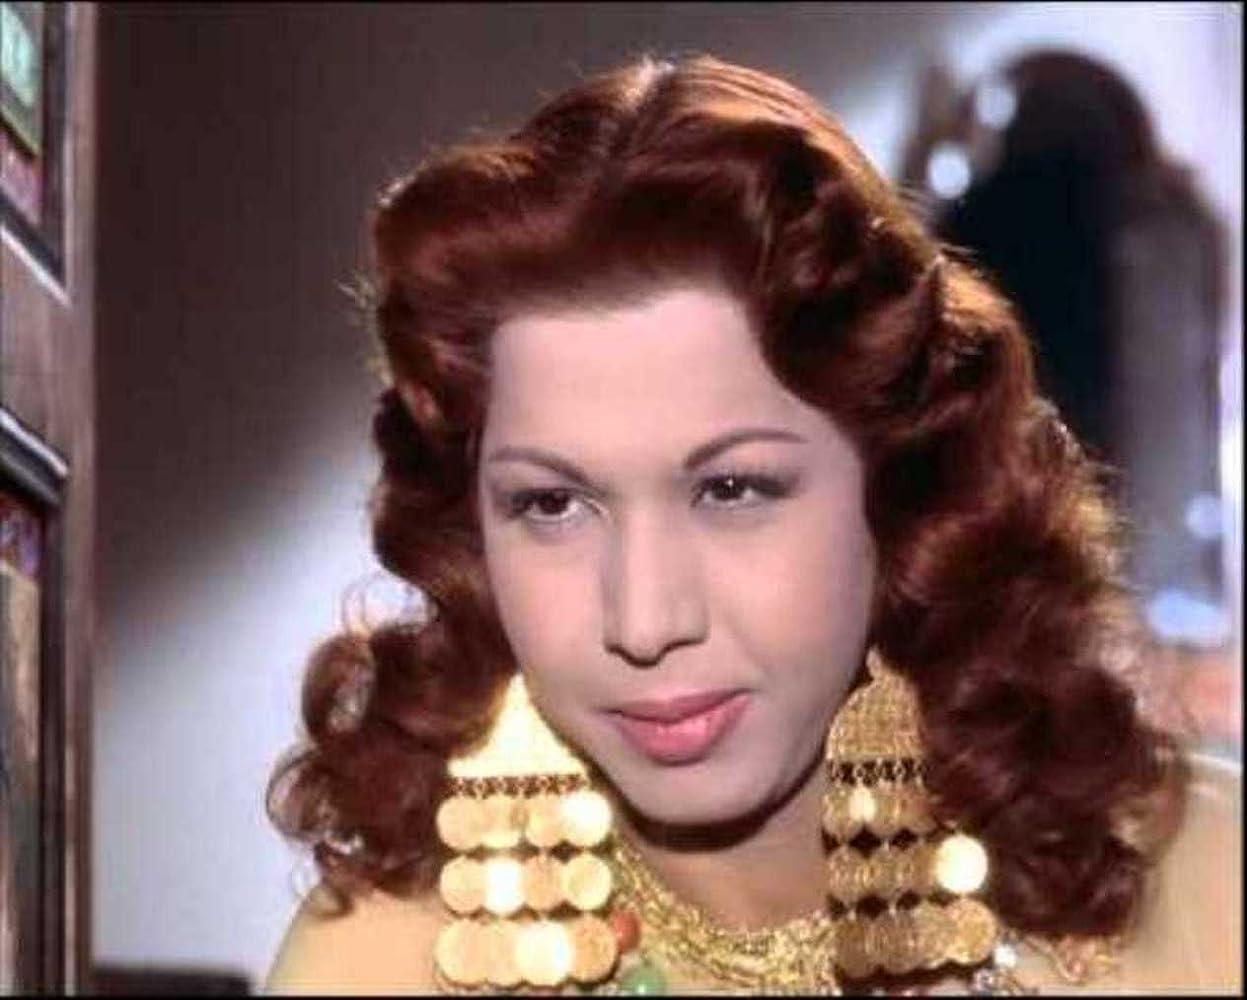 Samia Gamal in Ali Baba et les 40 voleurs (1954)